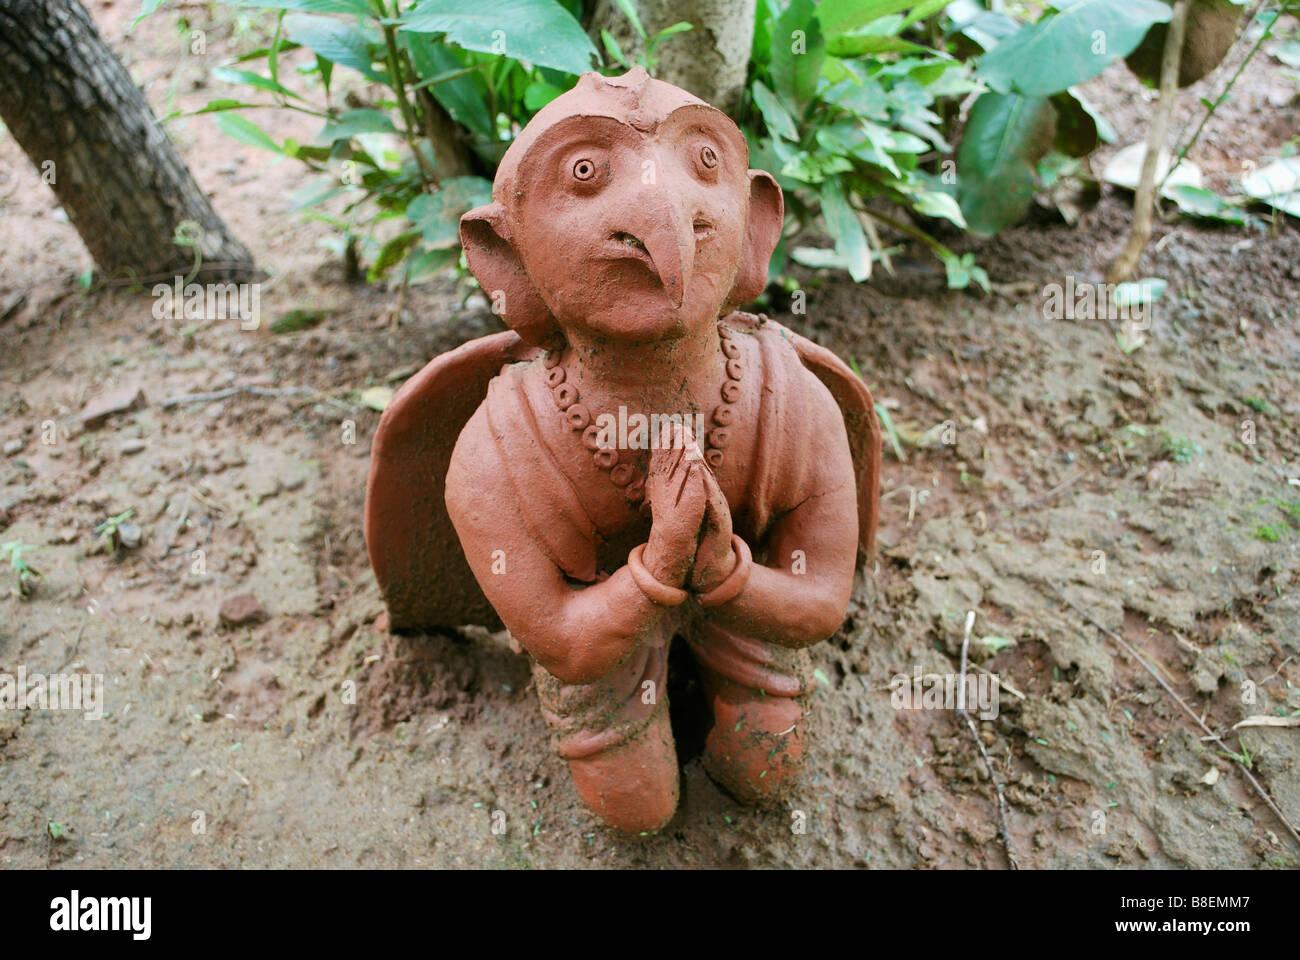 Garuda Avatar, struttura di terracotta a Manav Sangrahalaya, Bhopal, Madhya Pradesh, India Immagini Stock